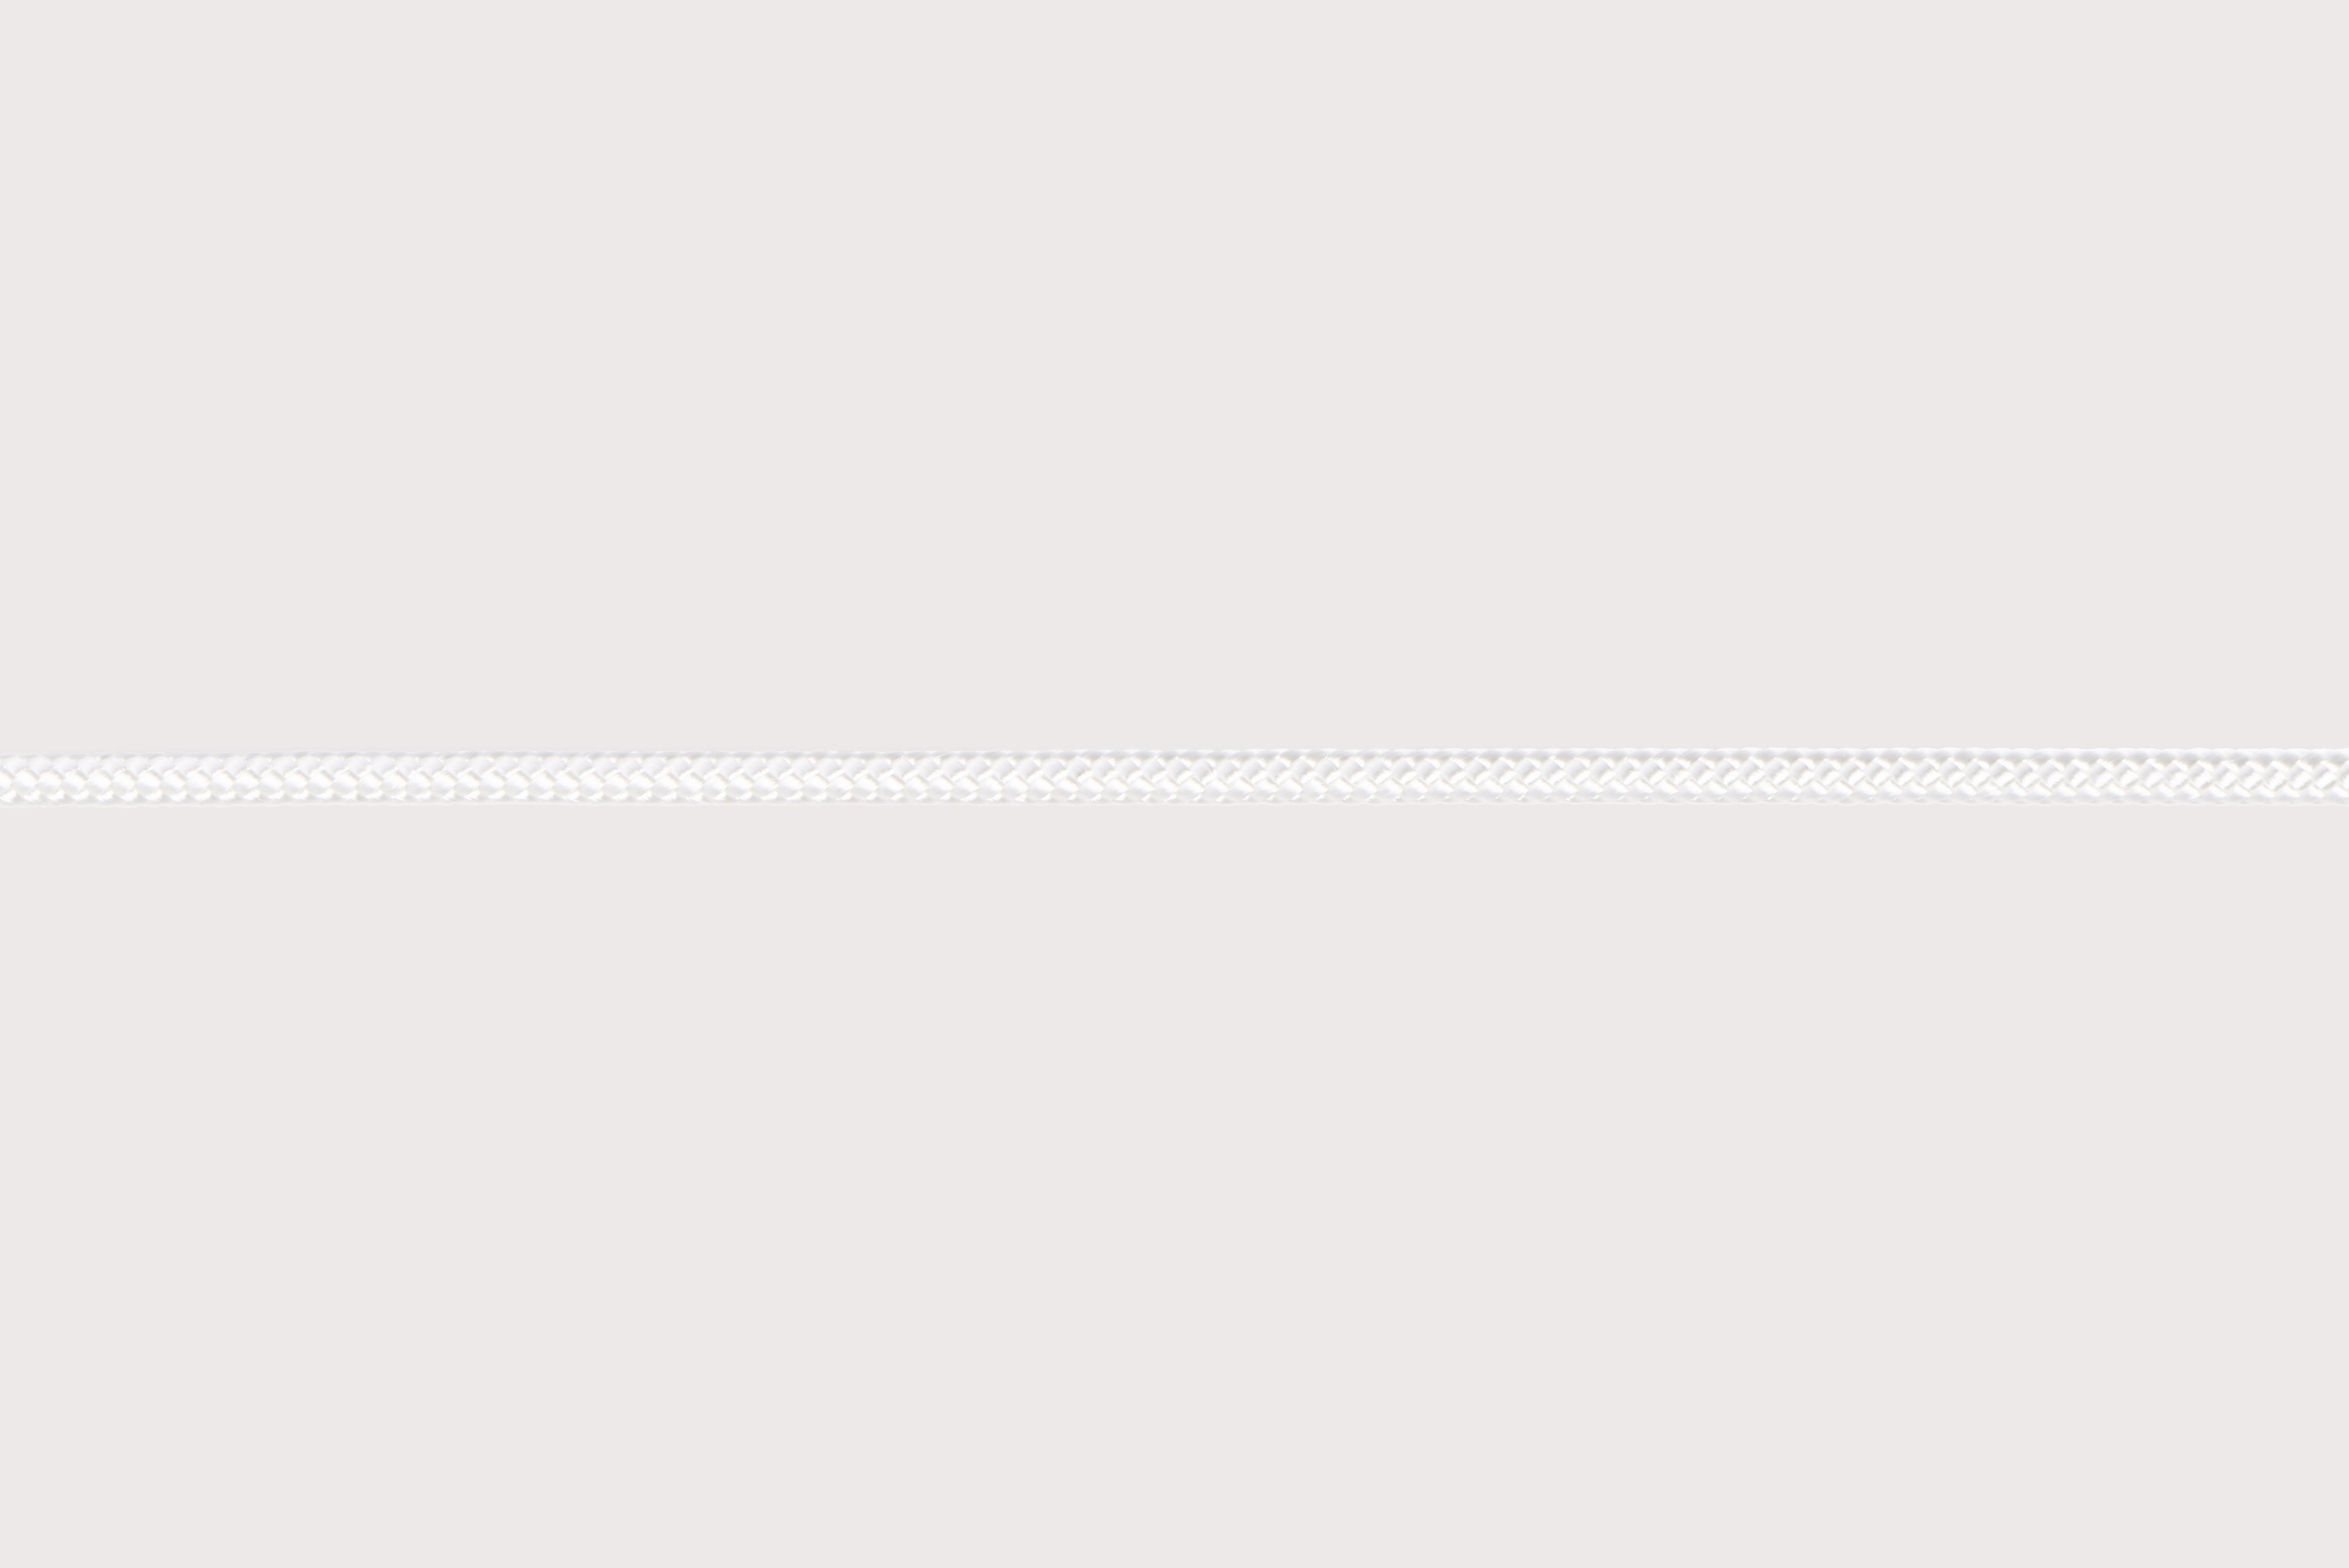 Orion-Cordage-Nylon Starter Cord-White-Horizontal77.jpg